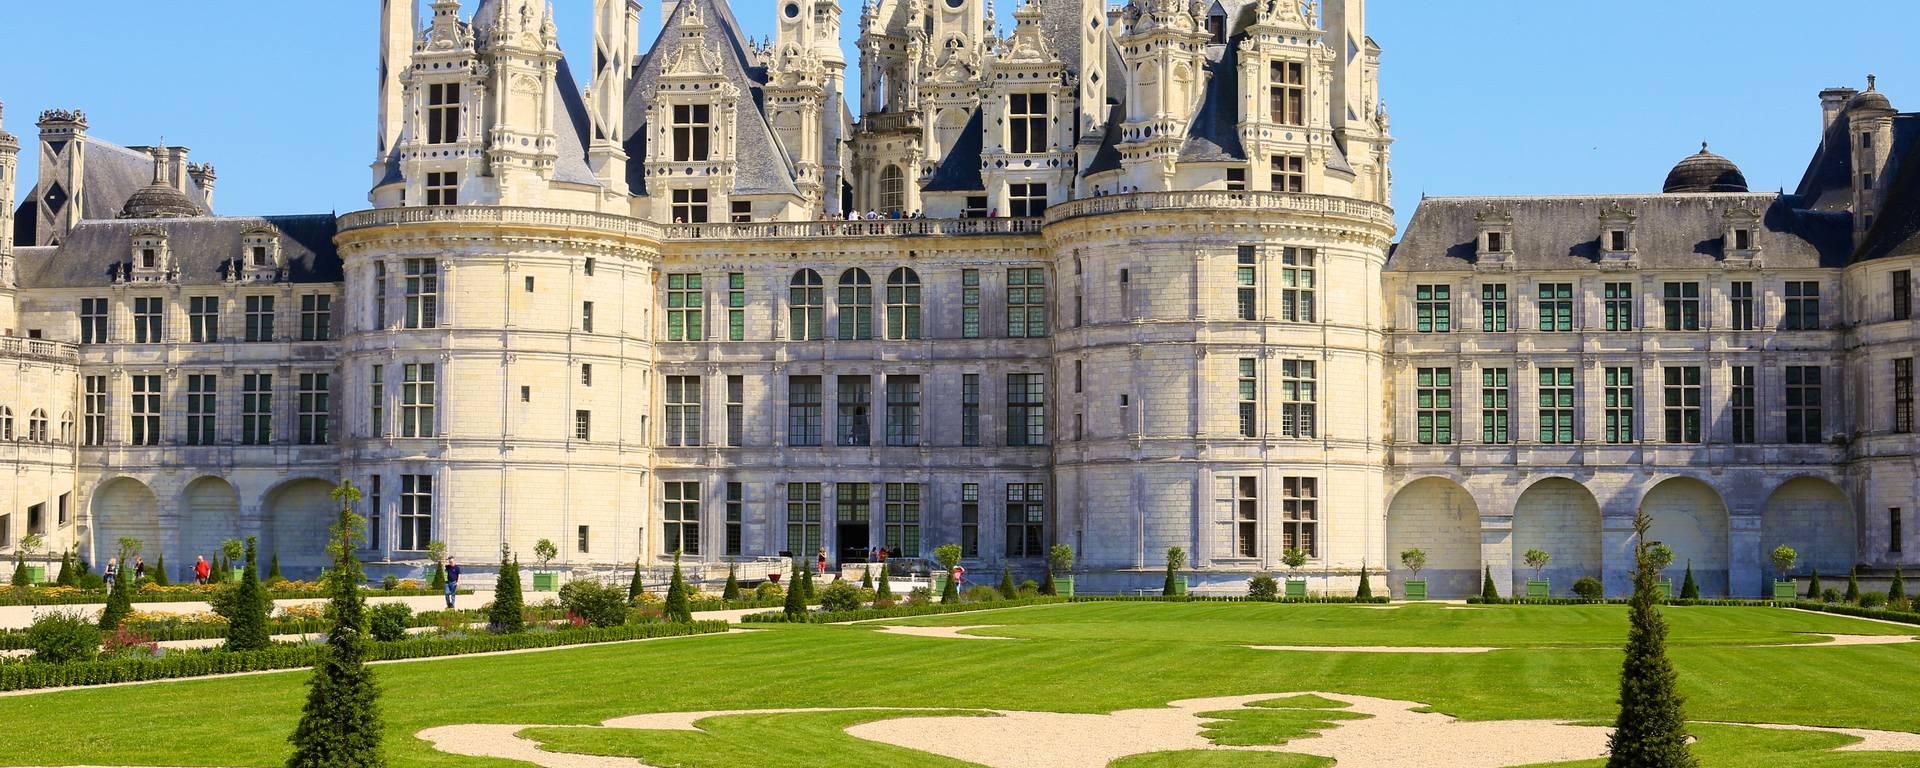 Jardines y castillo de Chambord. © Ludovic Letot